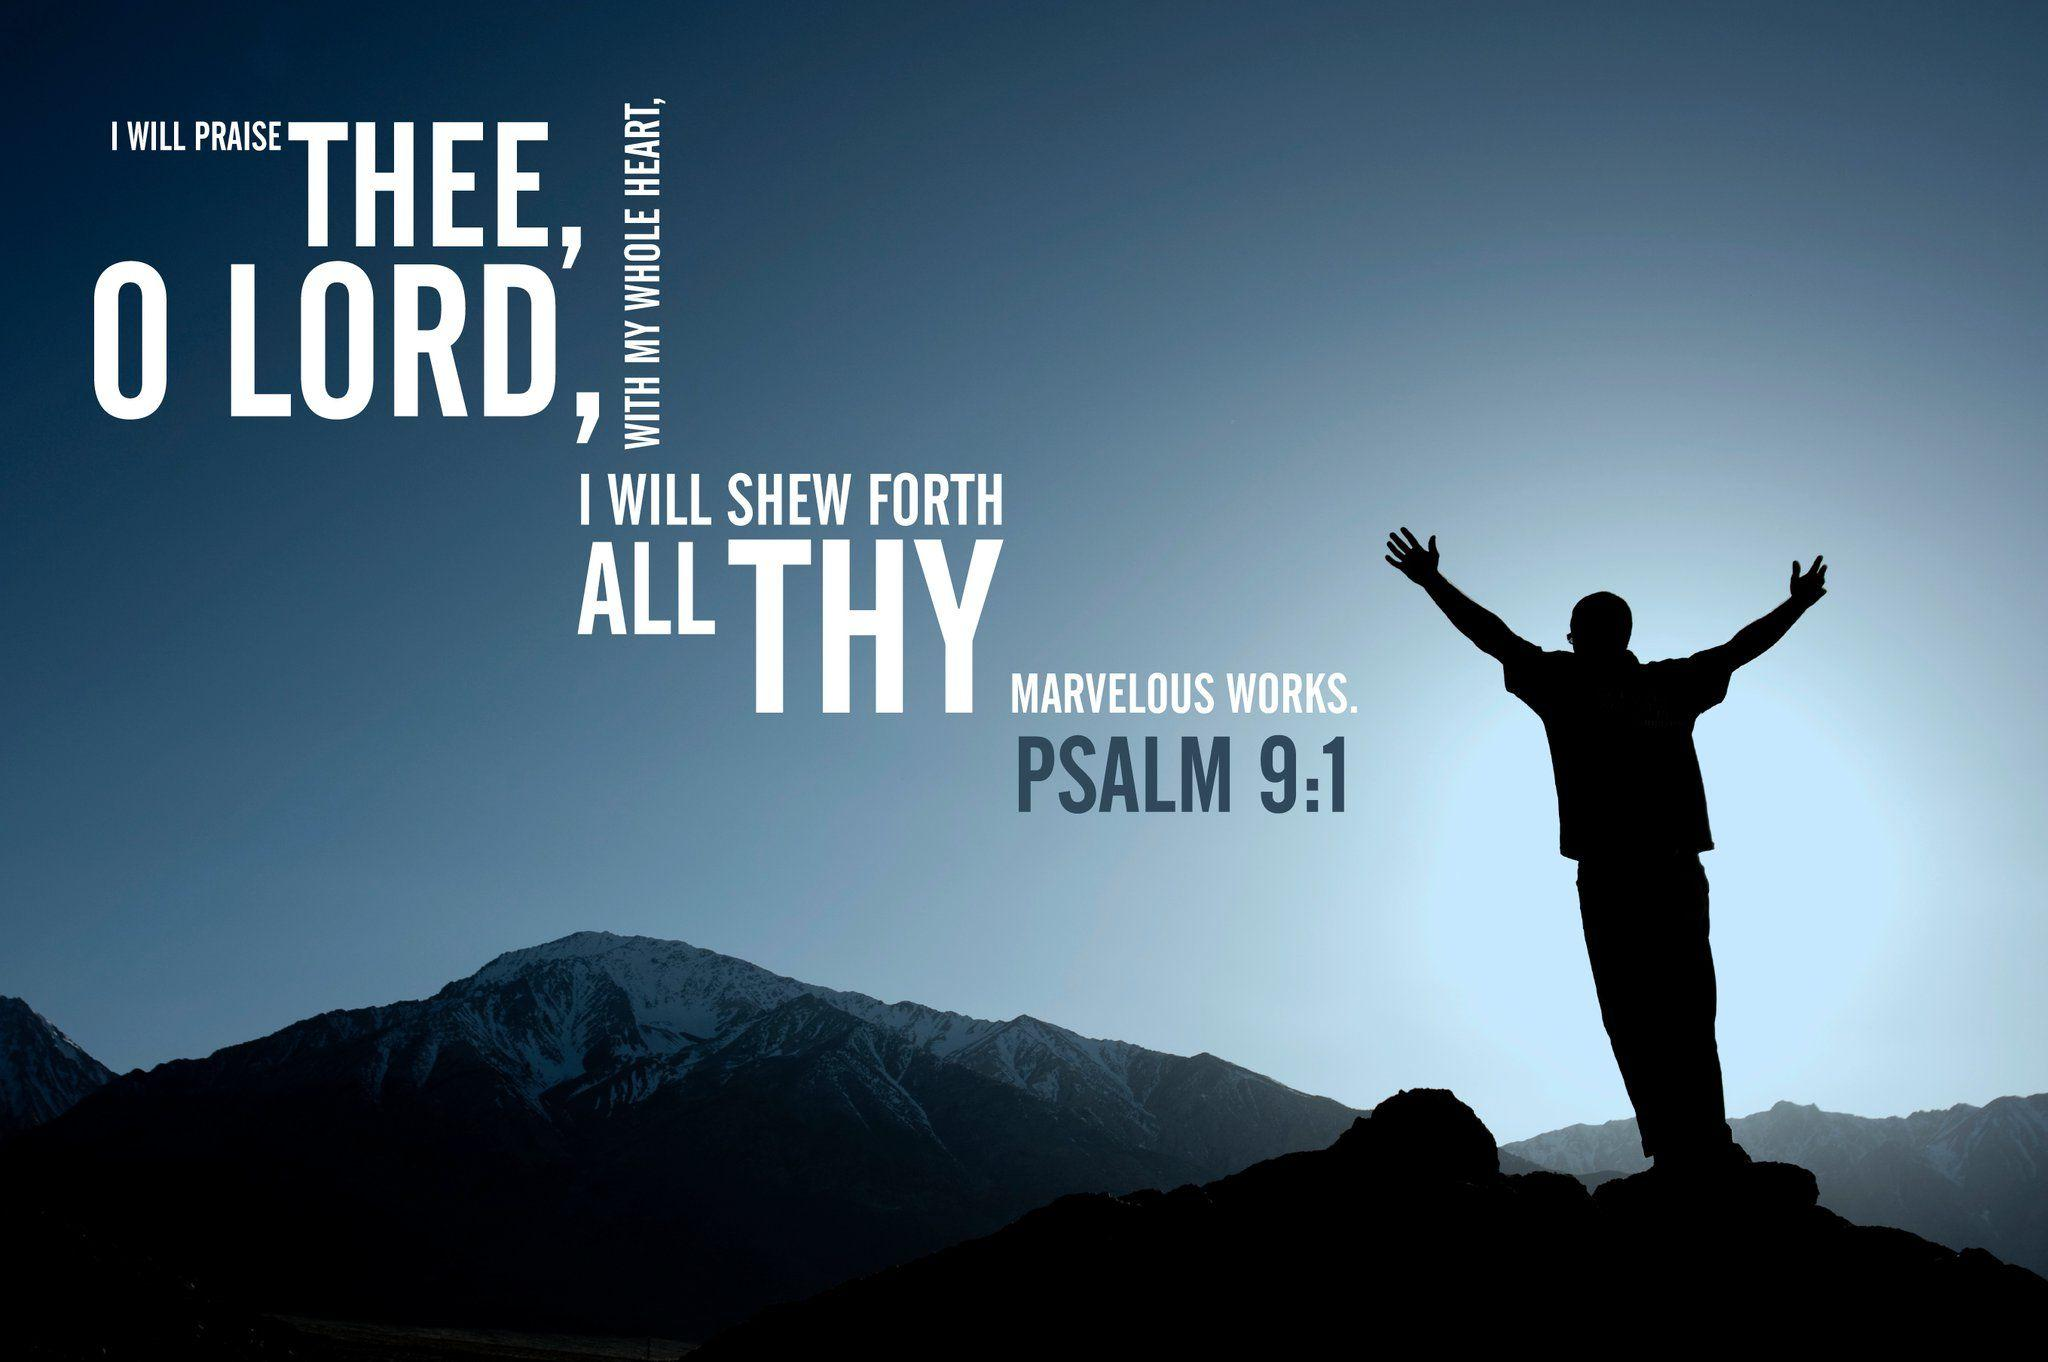 PROVIDENSIA ALLAH DAN KEWAJIBAN MANUSIA Mazmur 105:37-45